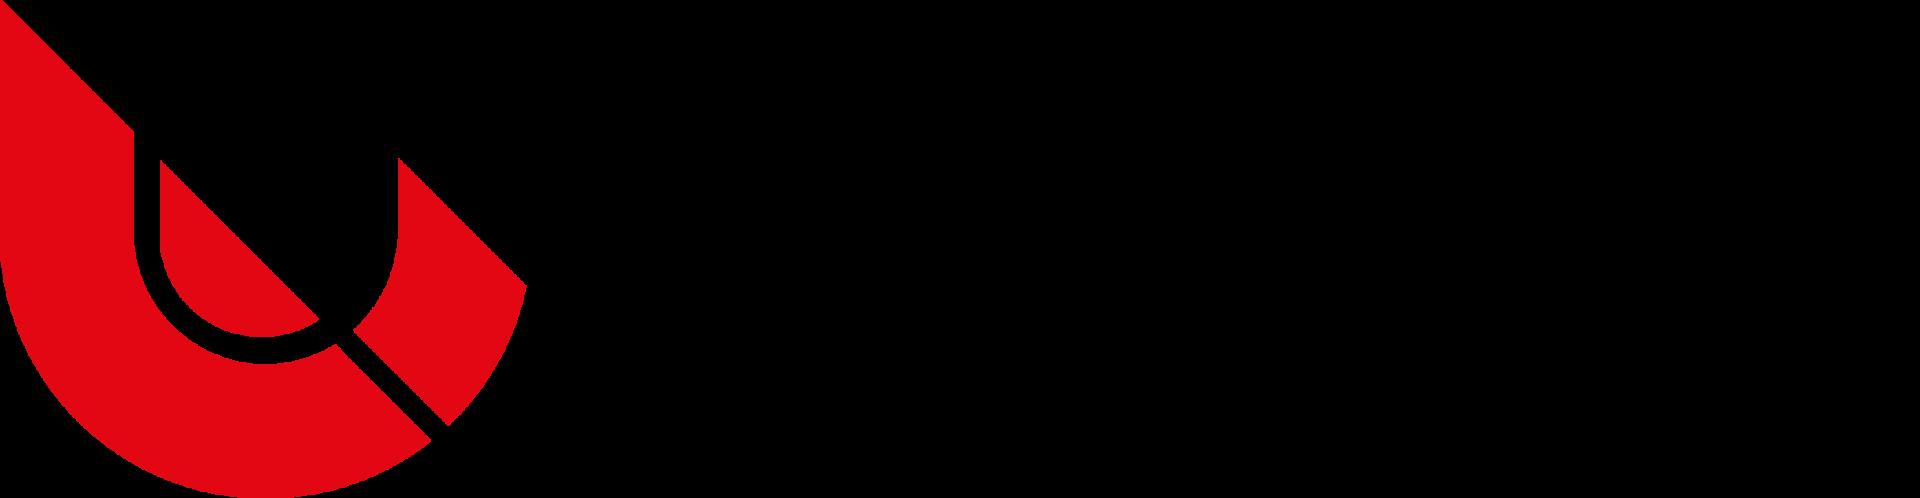 HMC 1500 DUIC logo november 2015